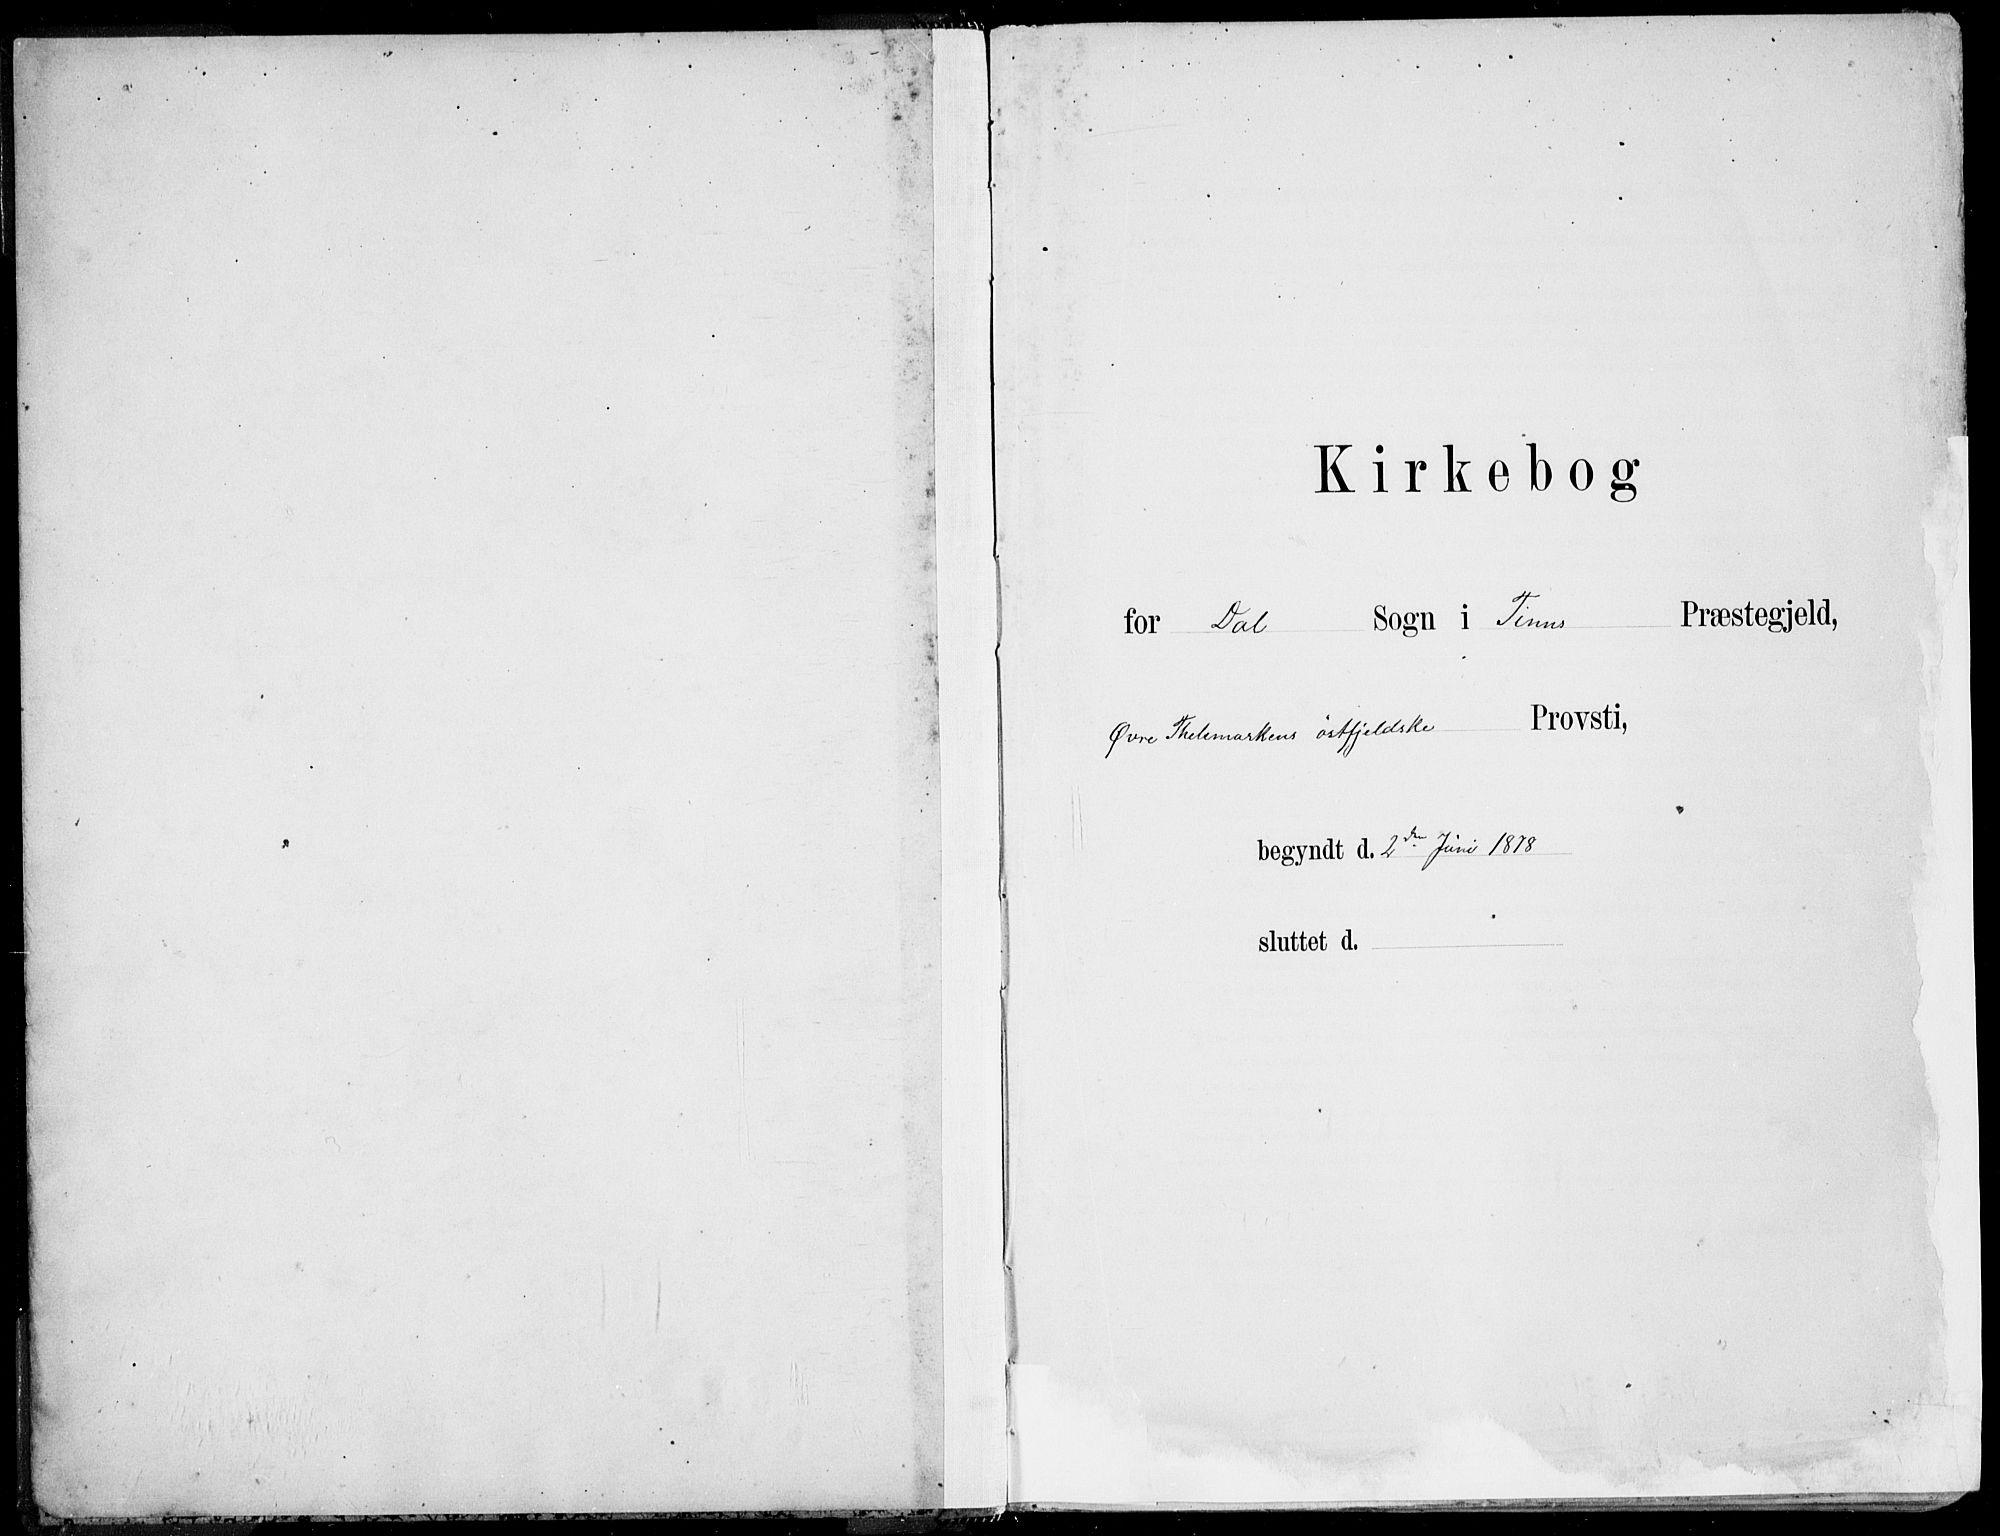 SAKO, Rjukan kirkebøker, F/Fa/L0001: Ministerialbok nr. 1, 1878-1912